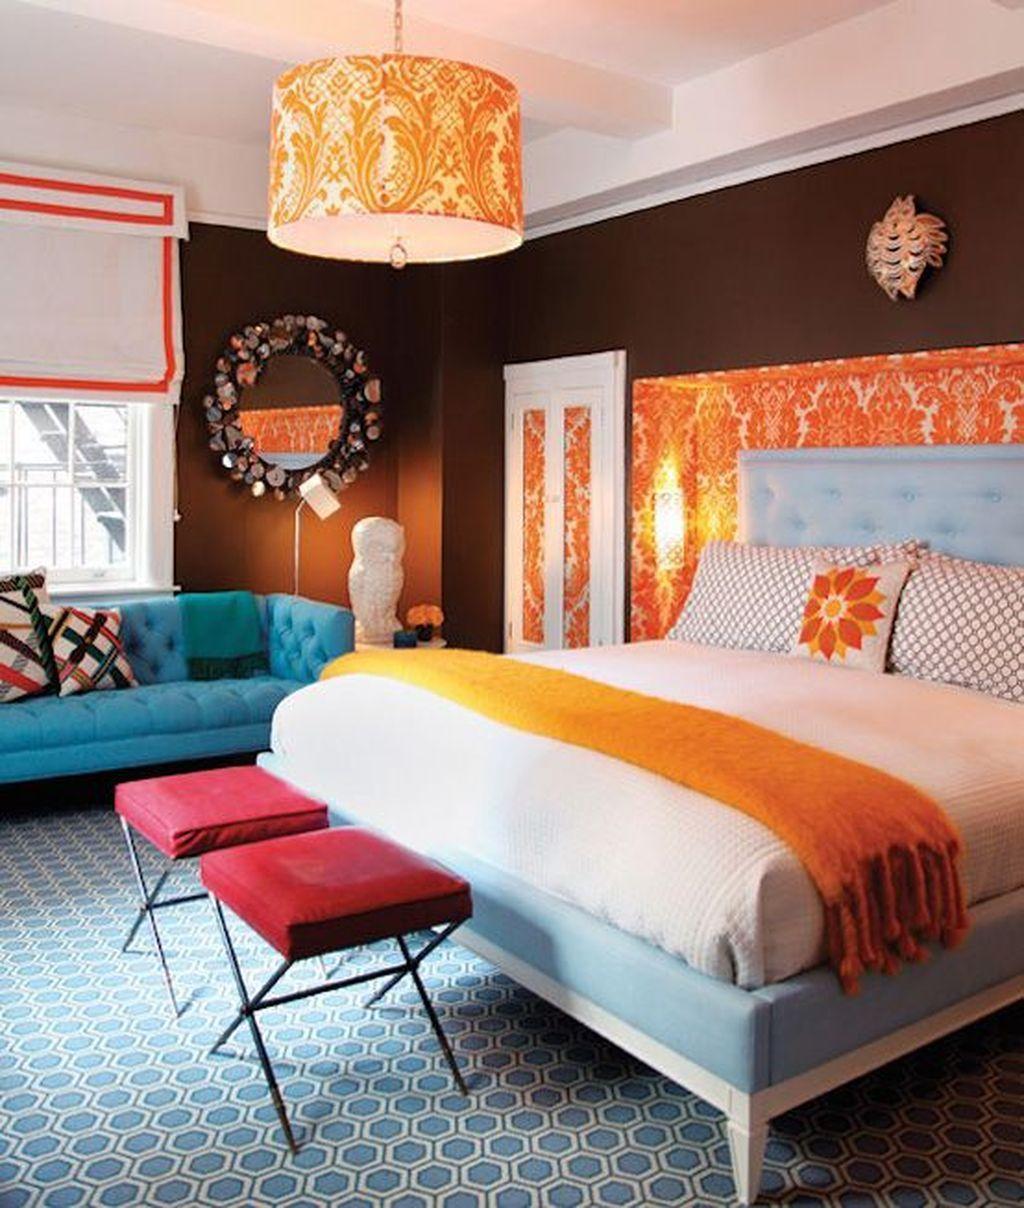 30 Modern Home Decor Ideas: 30+ Stunning Orange Bedroom Decorating Ideas For Modern